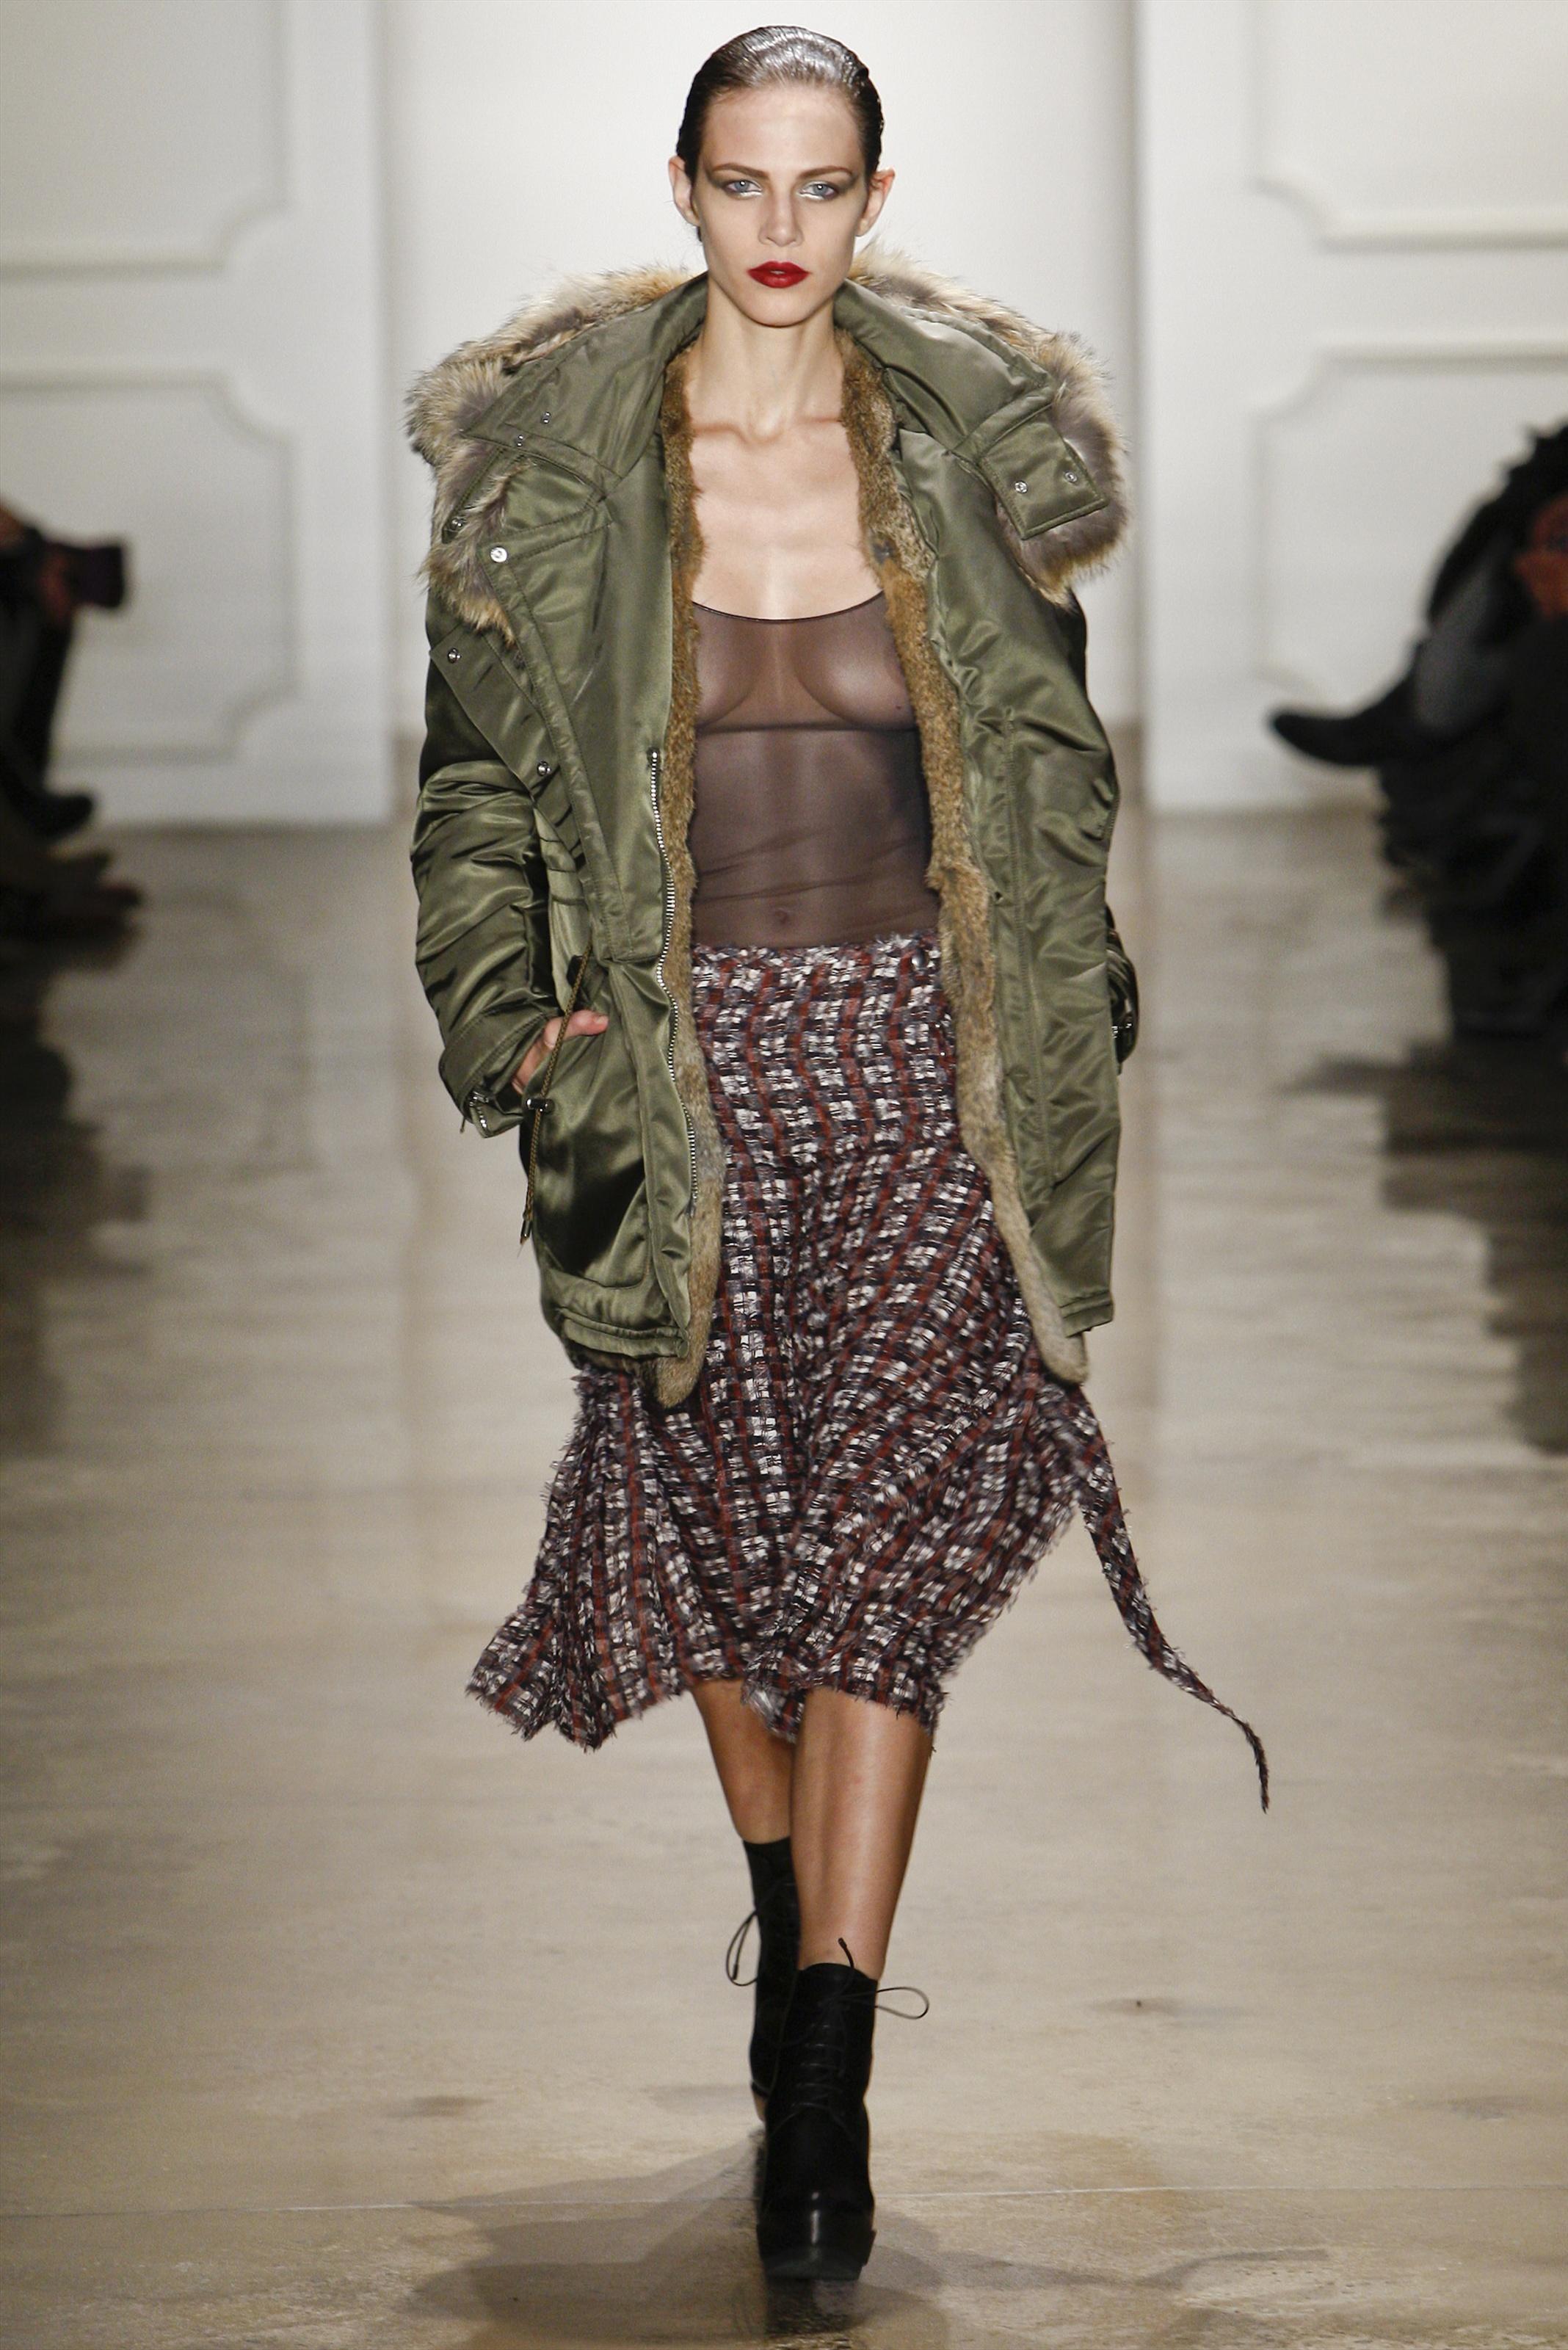 Модель пальто на синтепоне в стиле милитари – фото новинки и тренды сезона